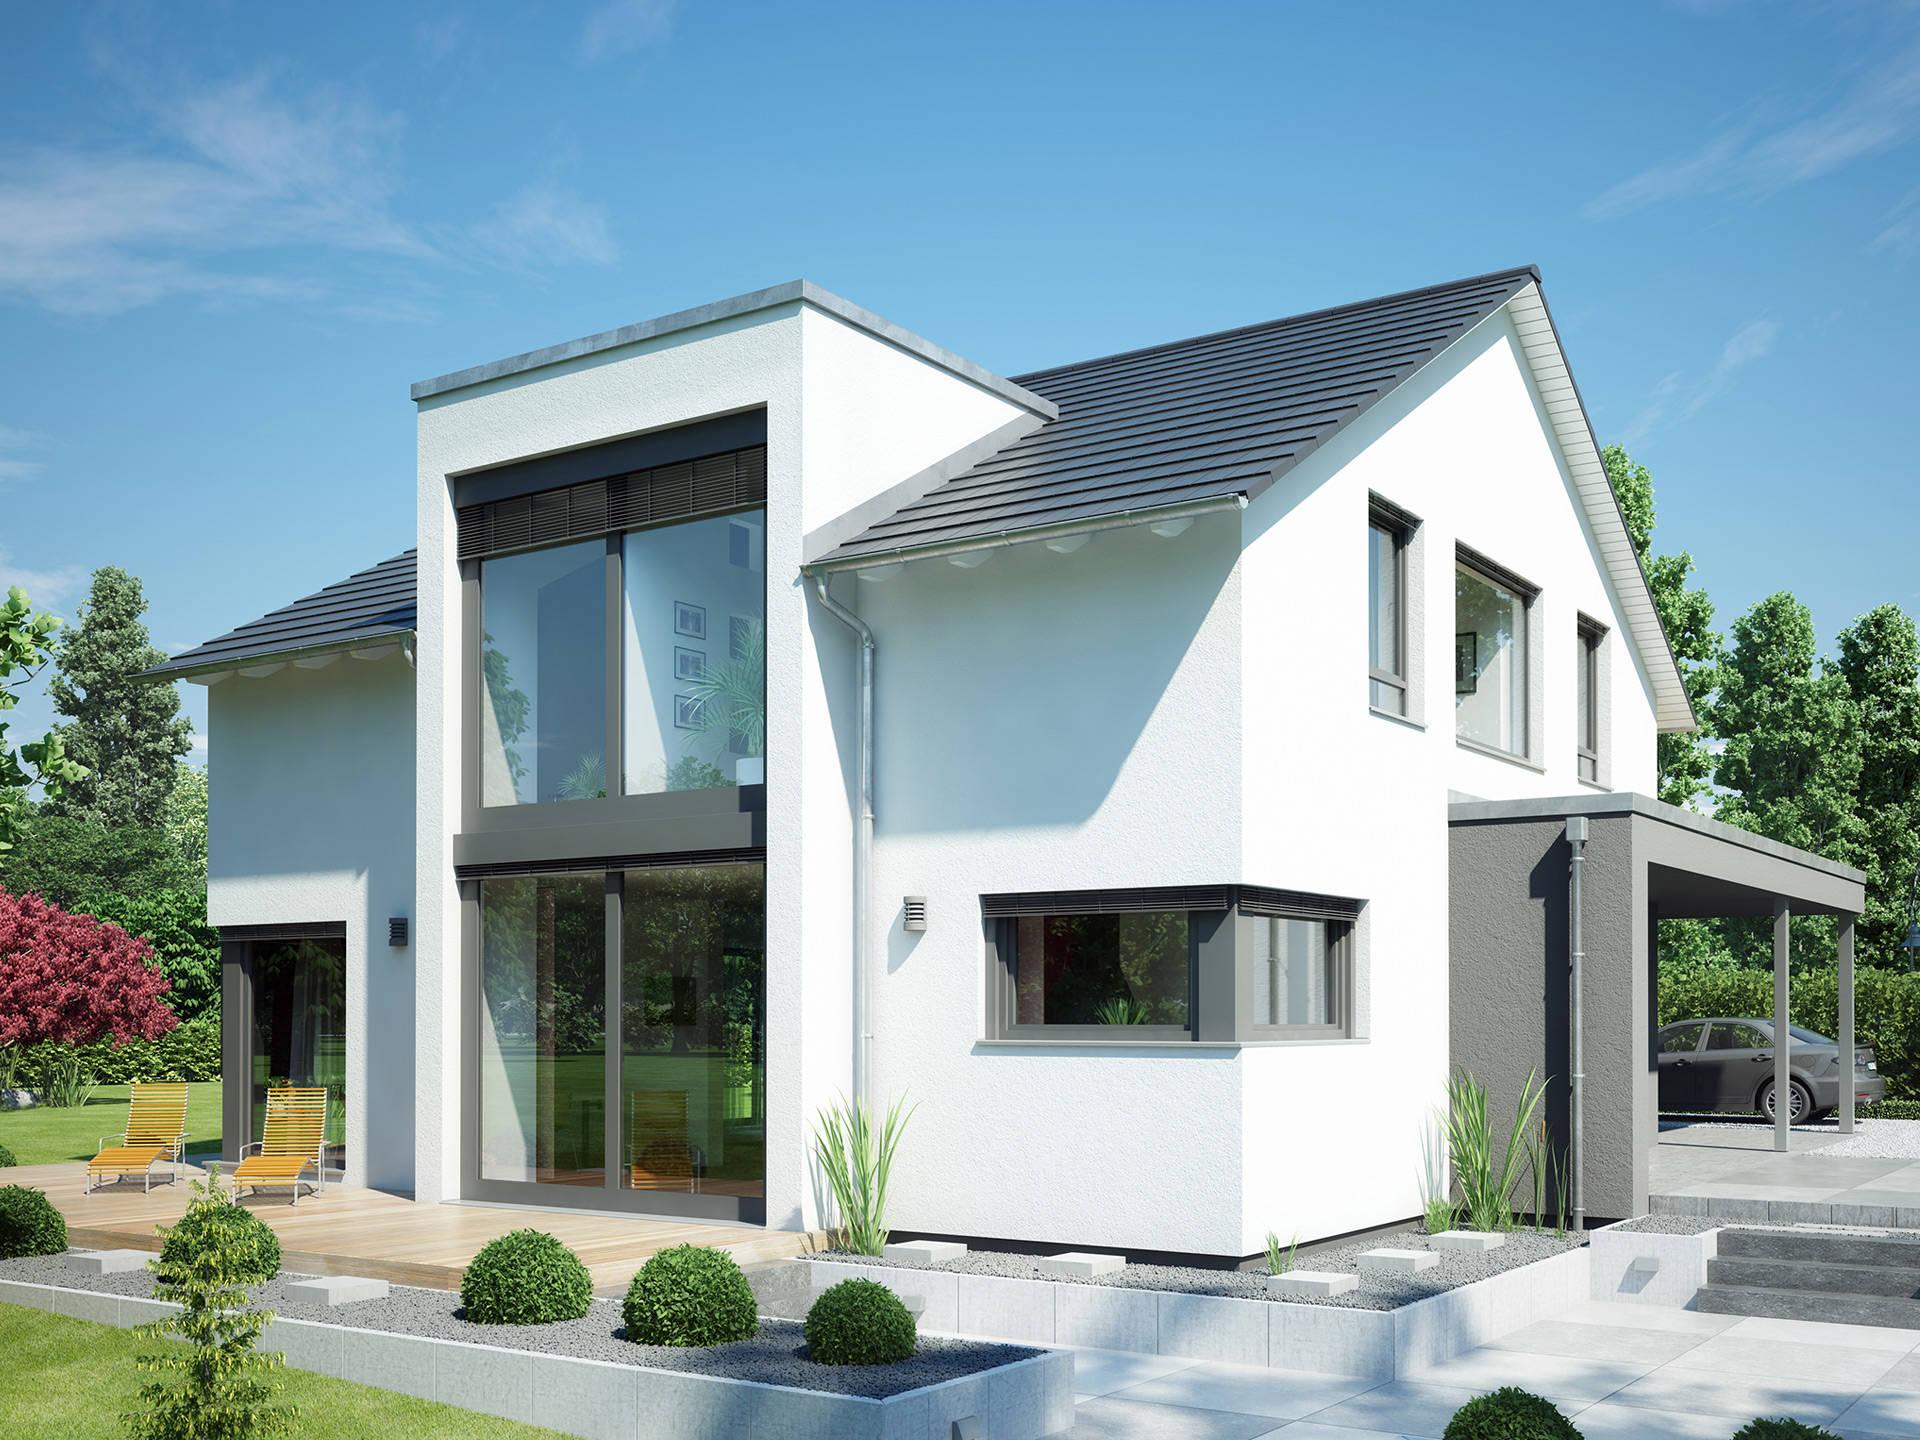 ^ oncept-M Köln Mod-lassic - rchitektenhaus - Bien-Zenker